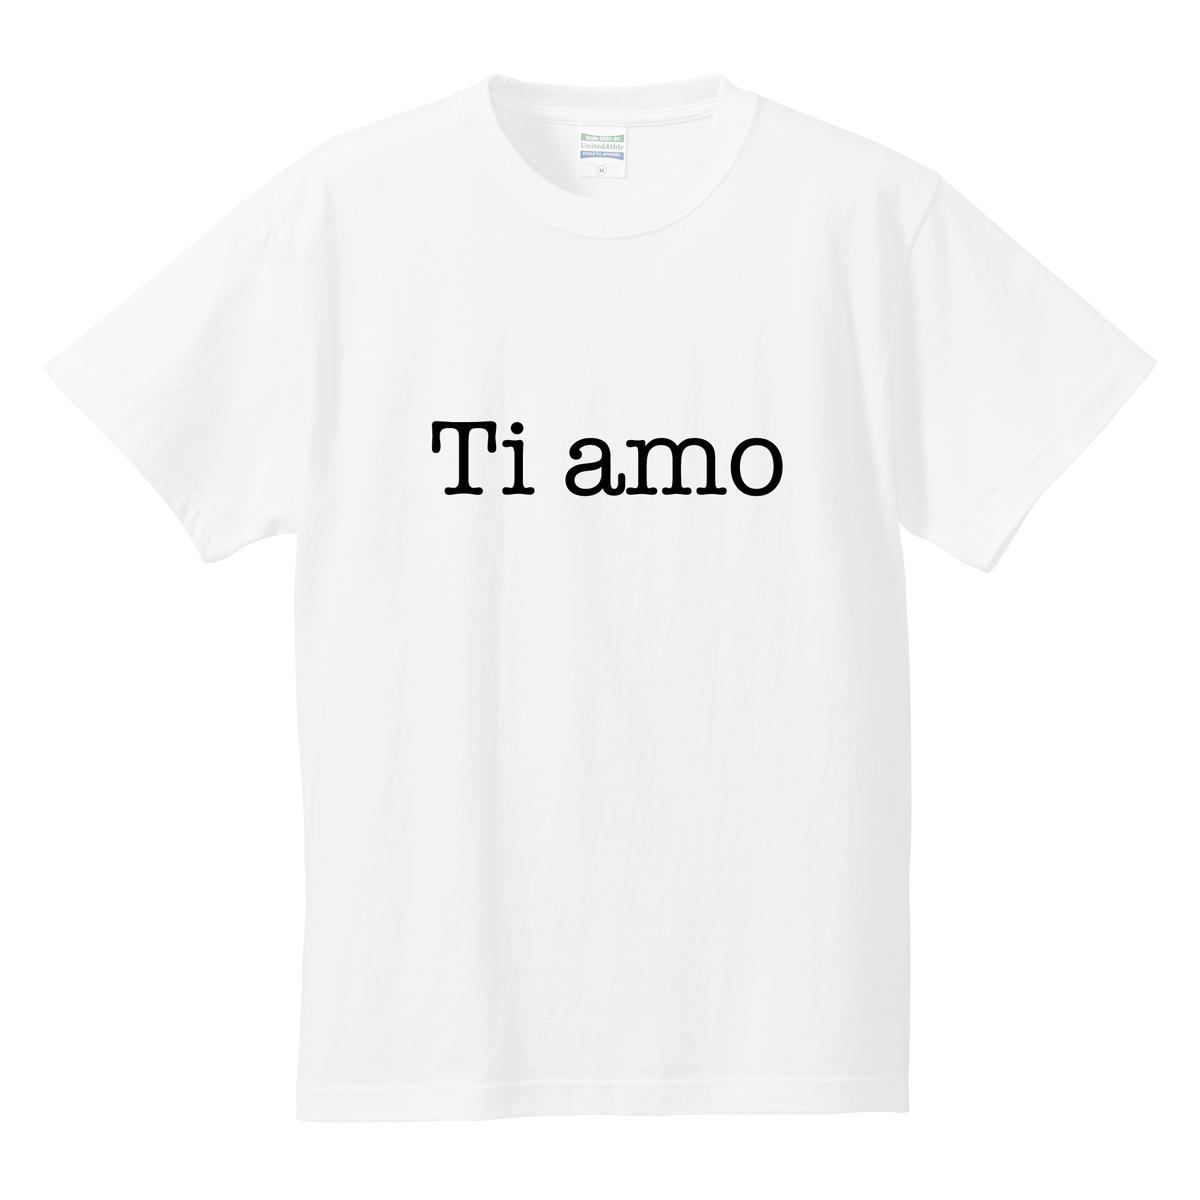 Ti amo Tシャツ